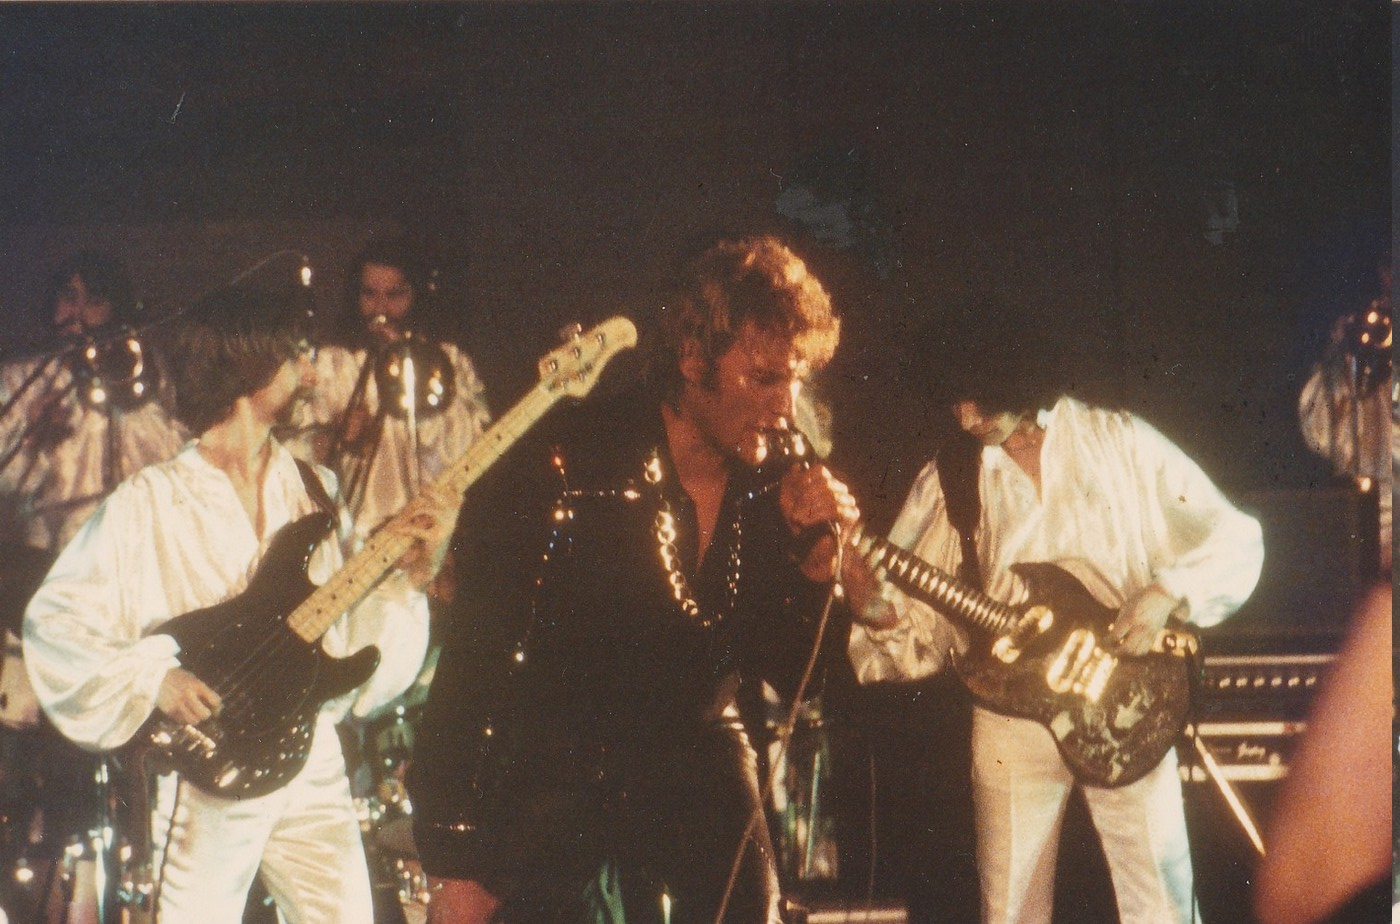 INÉDIT  :  JOHNNY HALLYDAY EN TOURNEE - HIVER 1978 -1979 ( PHOTOS INÉDITES )   Img_2638